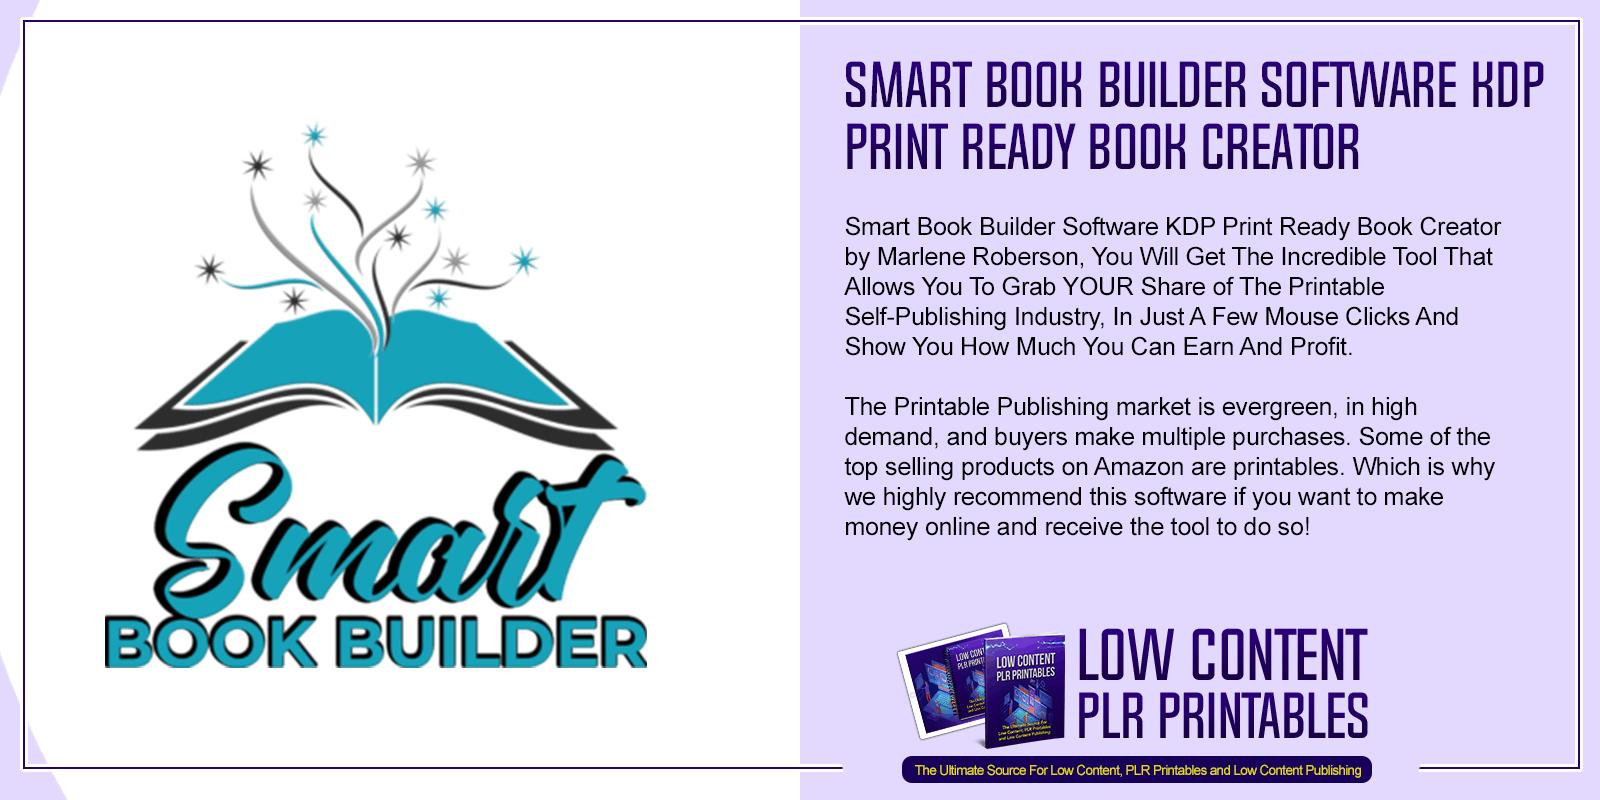 Smart Book Builder Software KDP Print Ready Book Creator